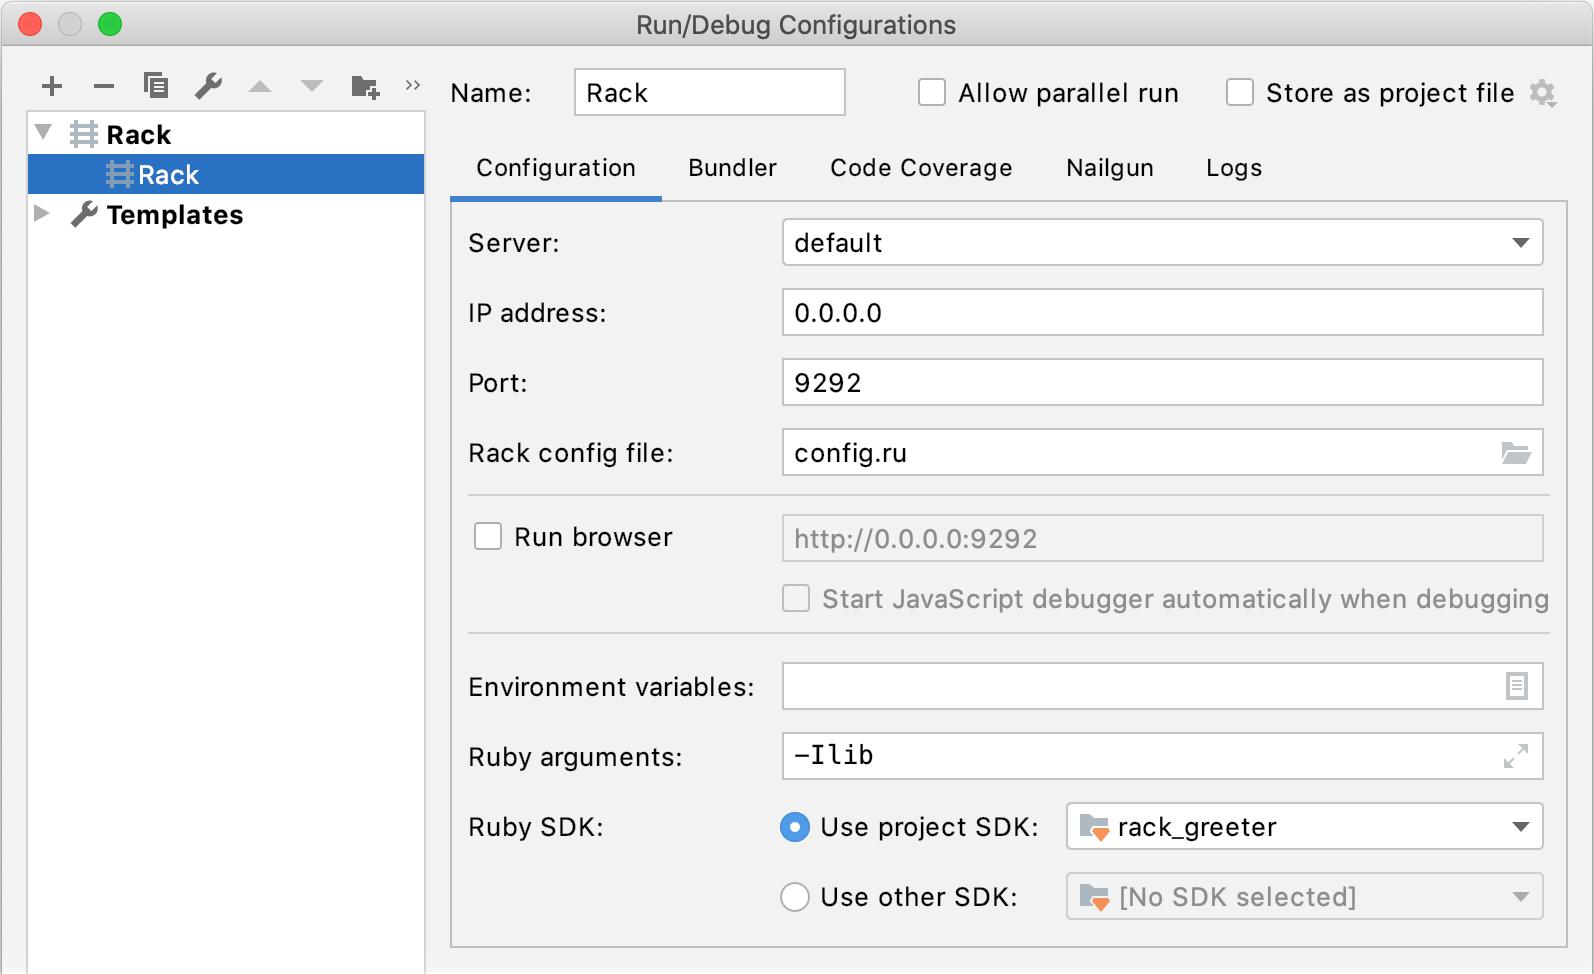 Run/Debug Configuration: Rack